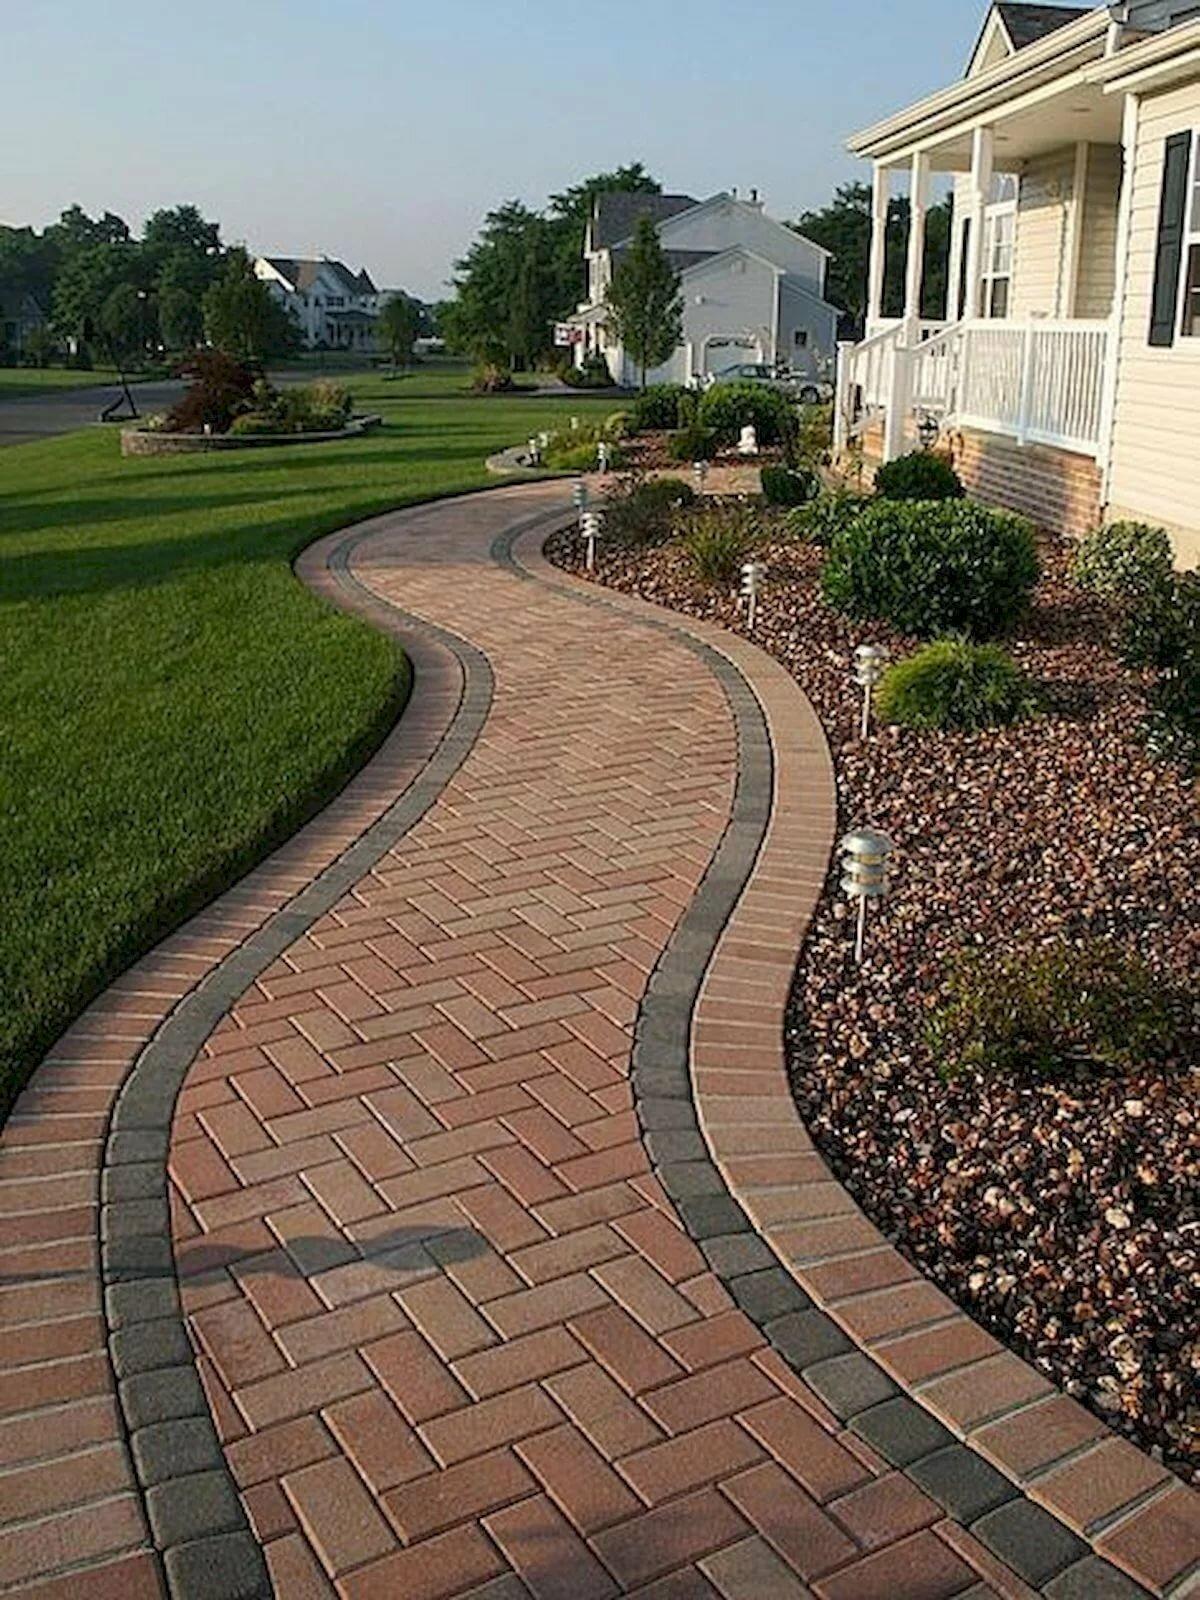 interlocking pavers for home driveways amp walkways - 600×800